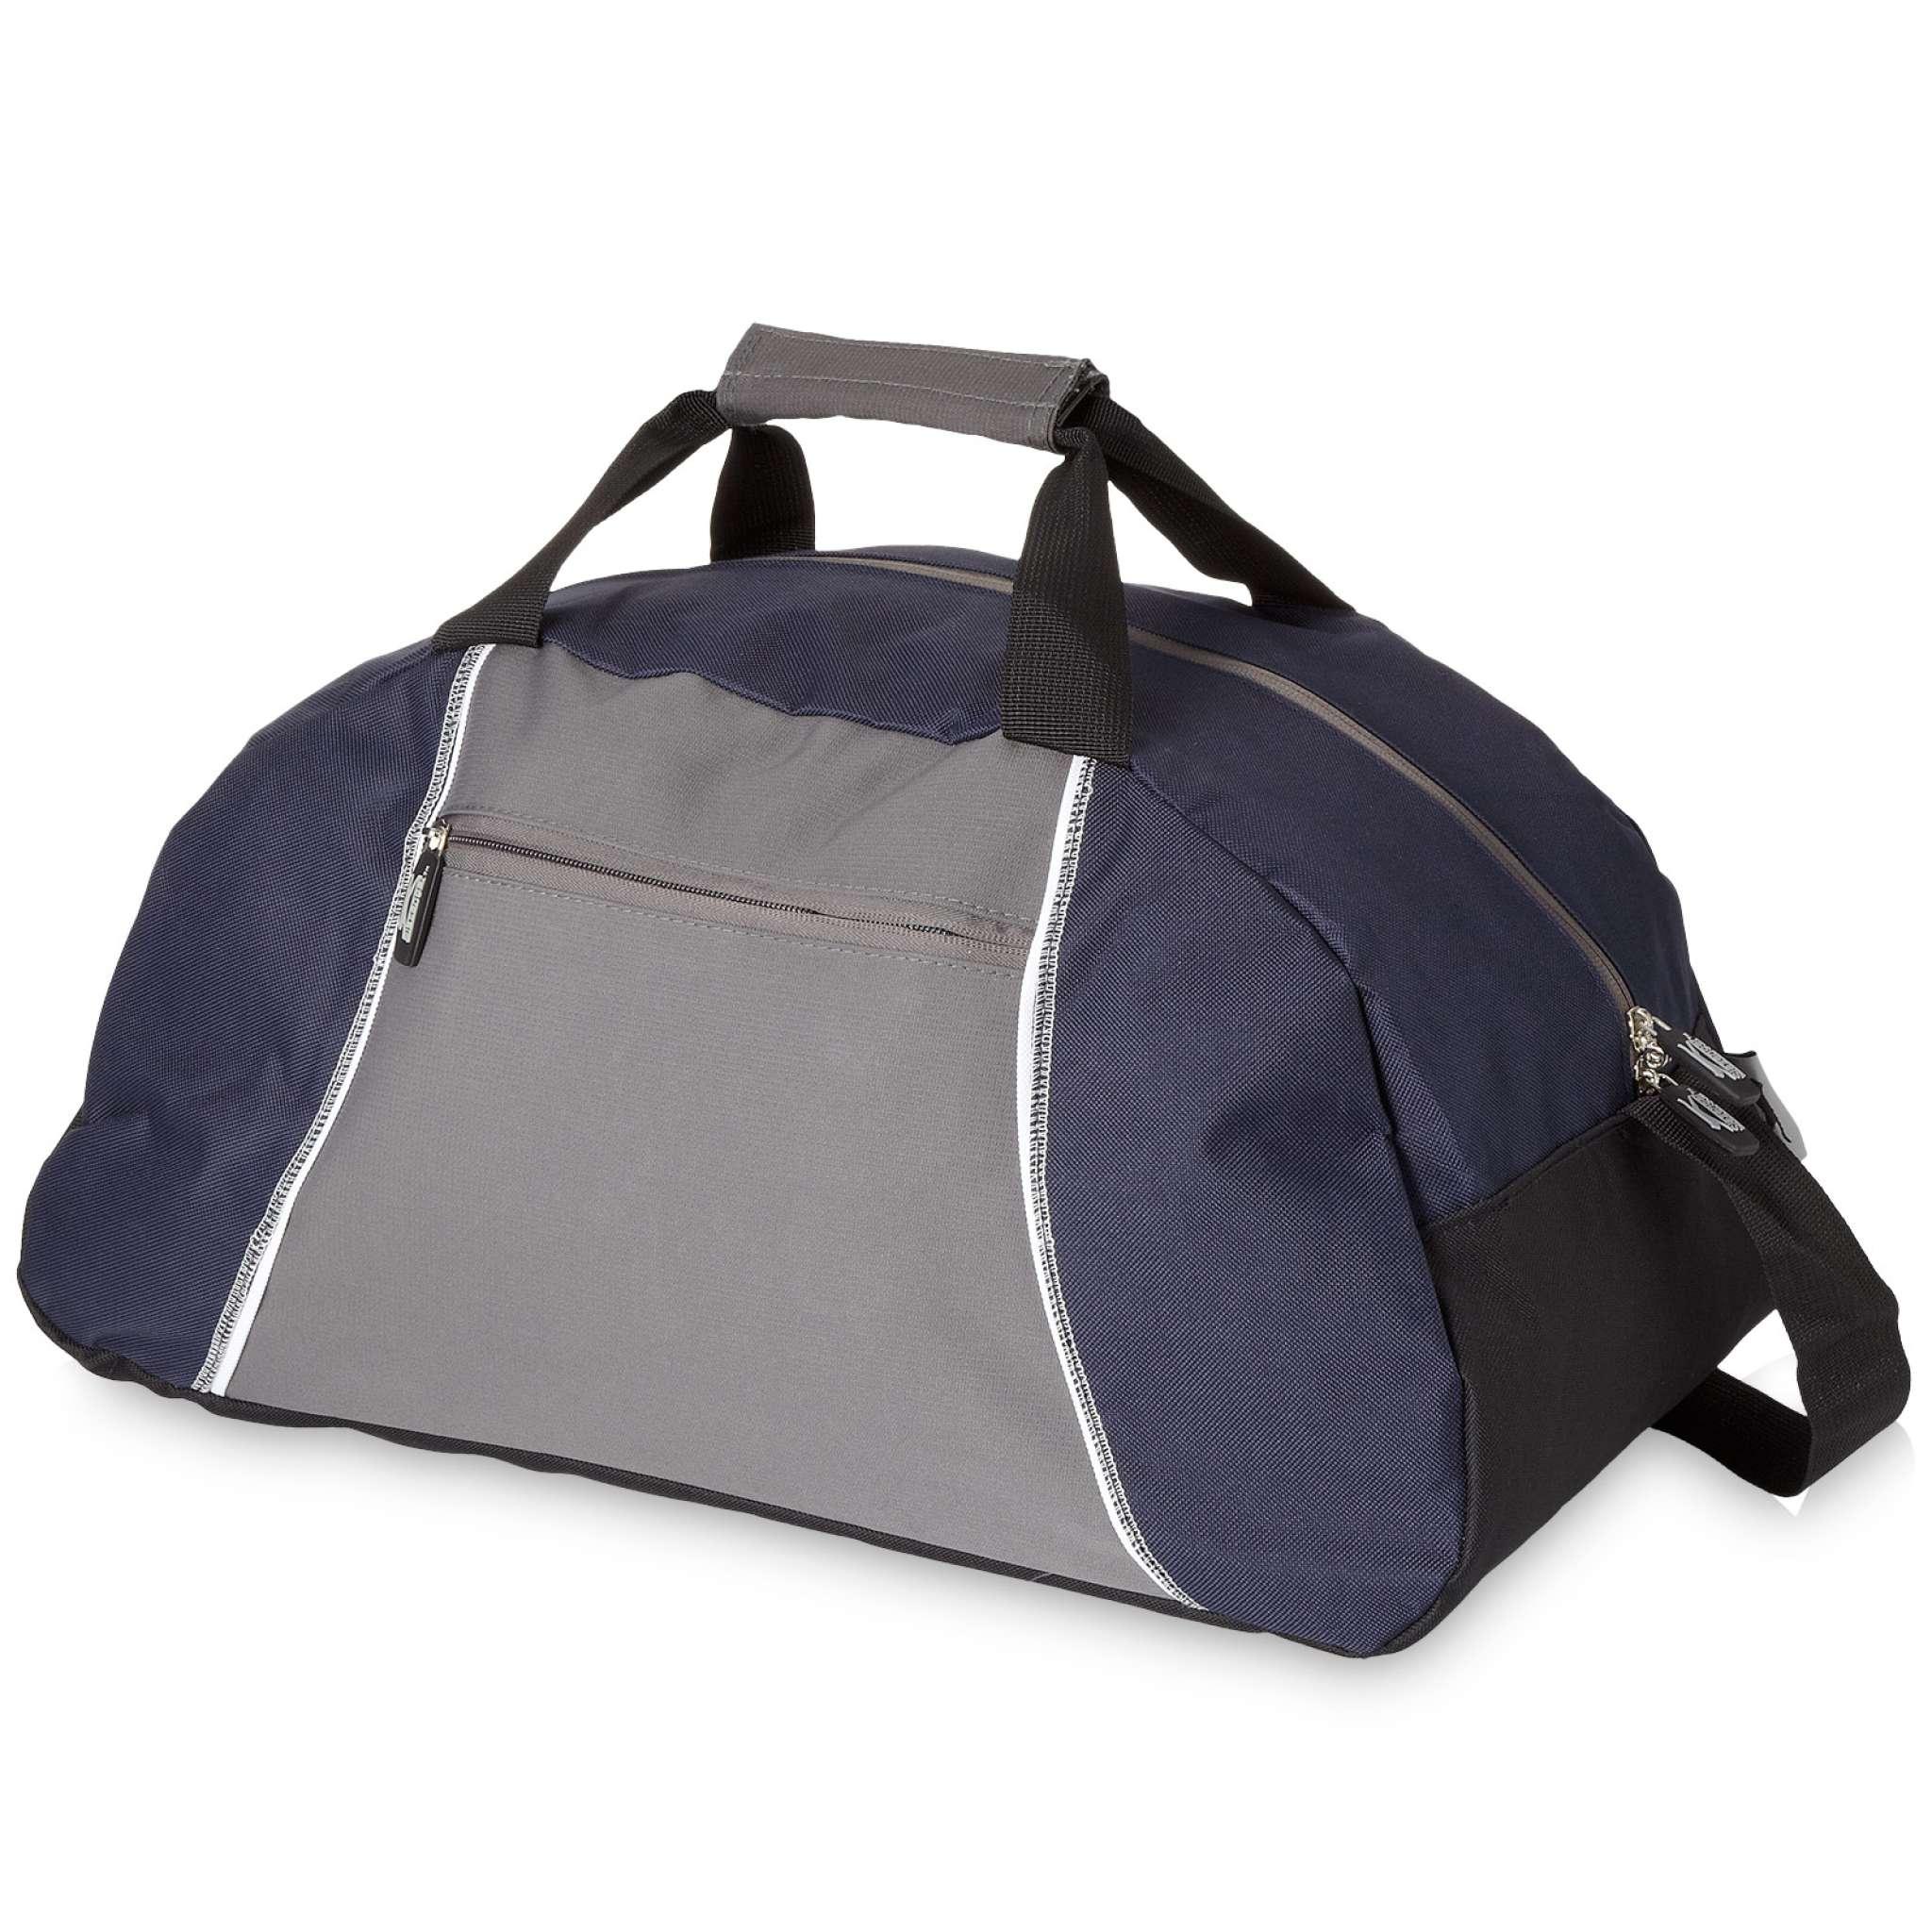 Guldbonus: Slazenger Sportbag